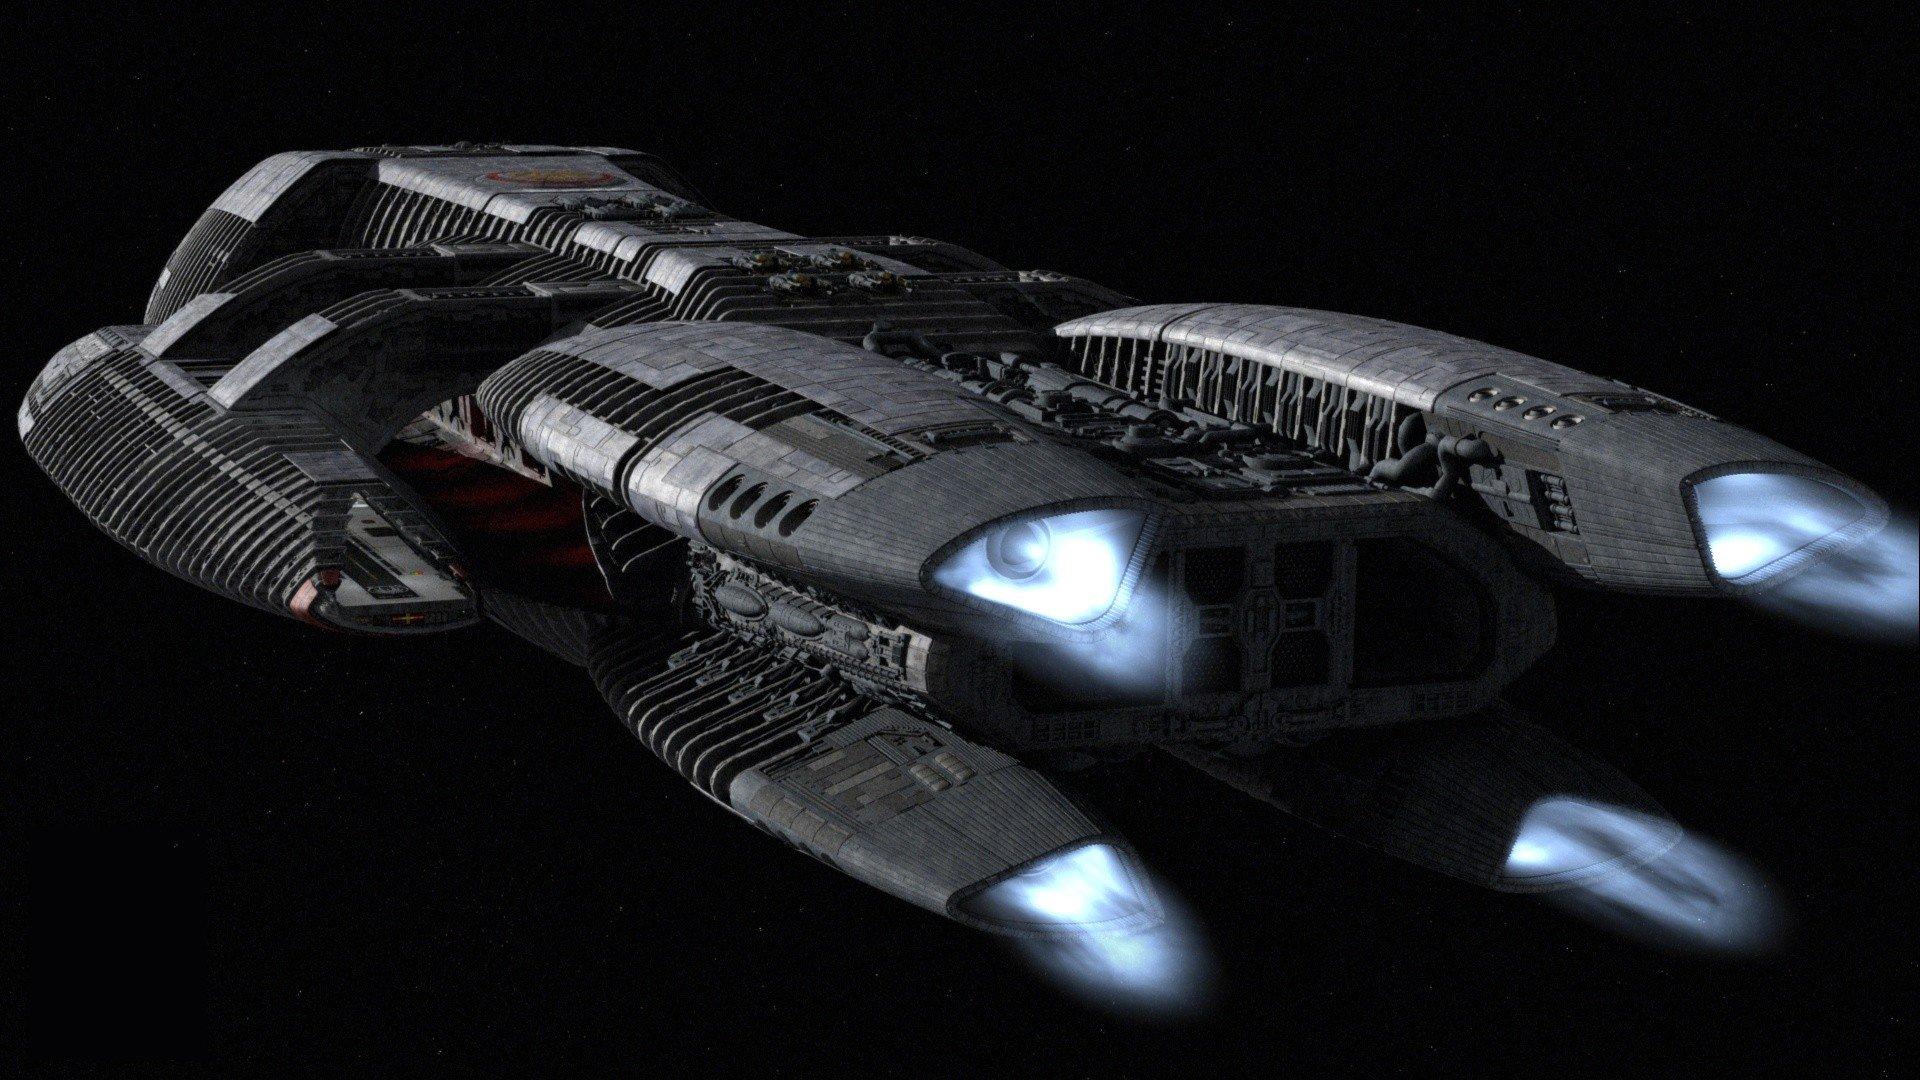 Televisieprogramma - Battlestar Galactica (2003)  Battlestar Galactica Ruimteschip Wallpaper